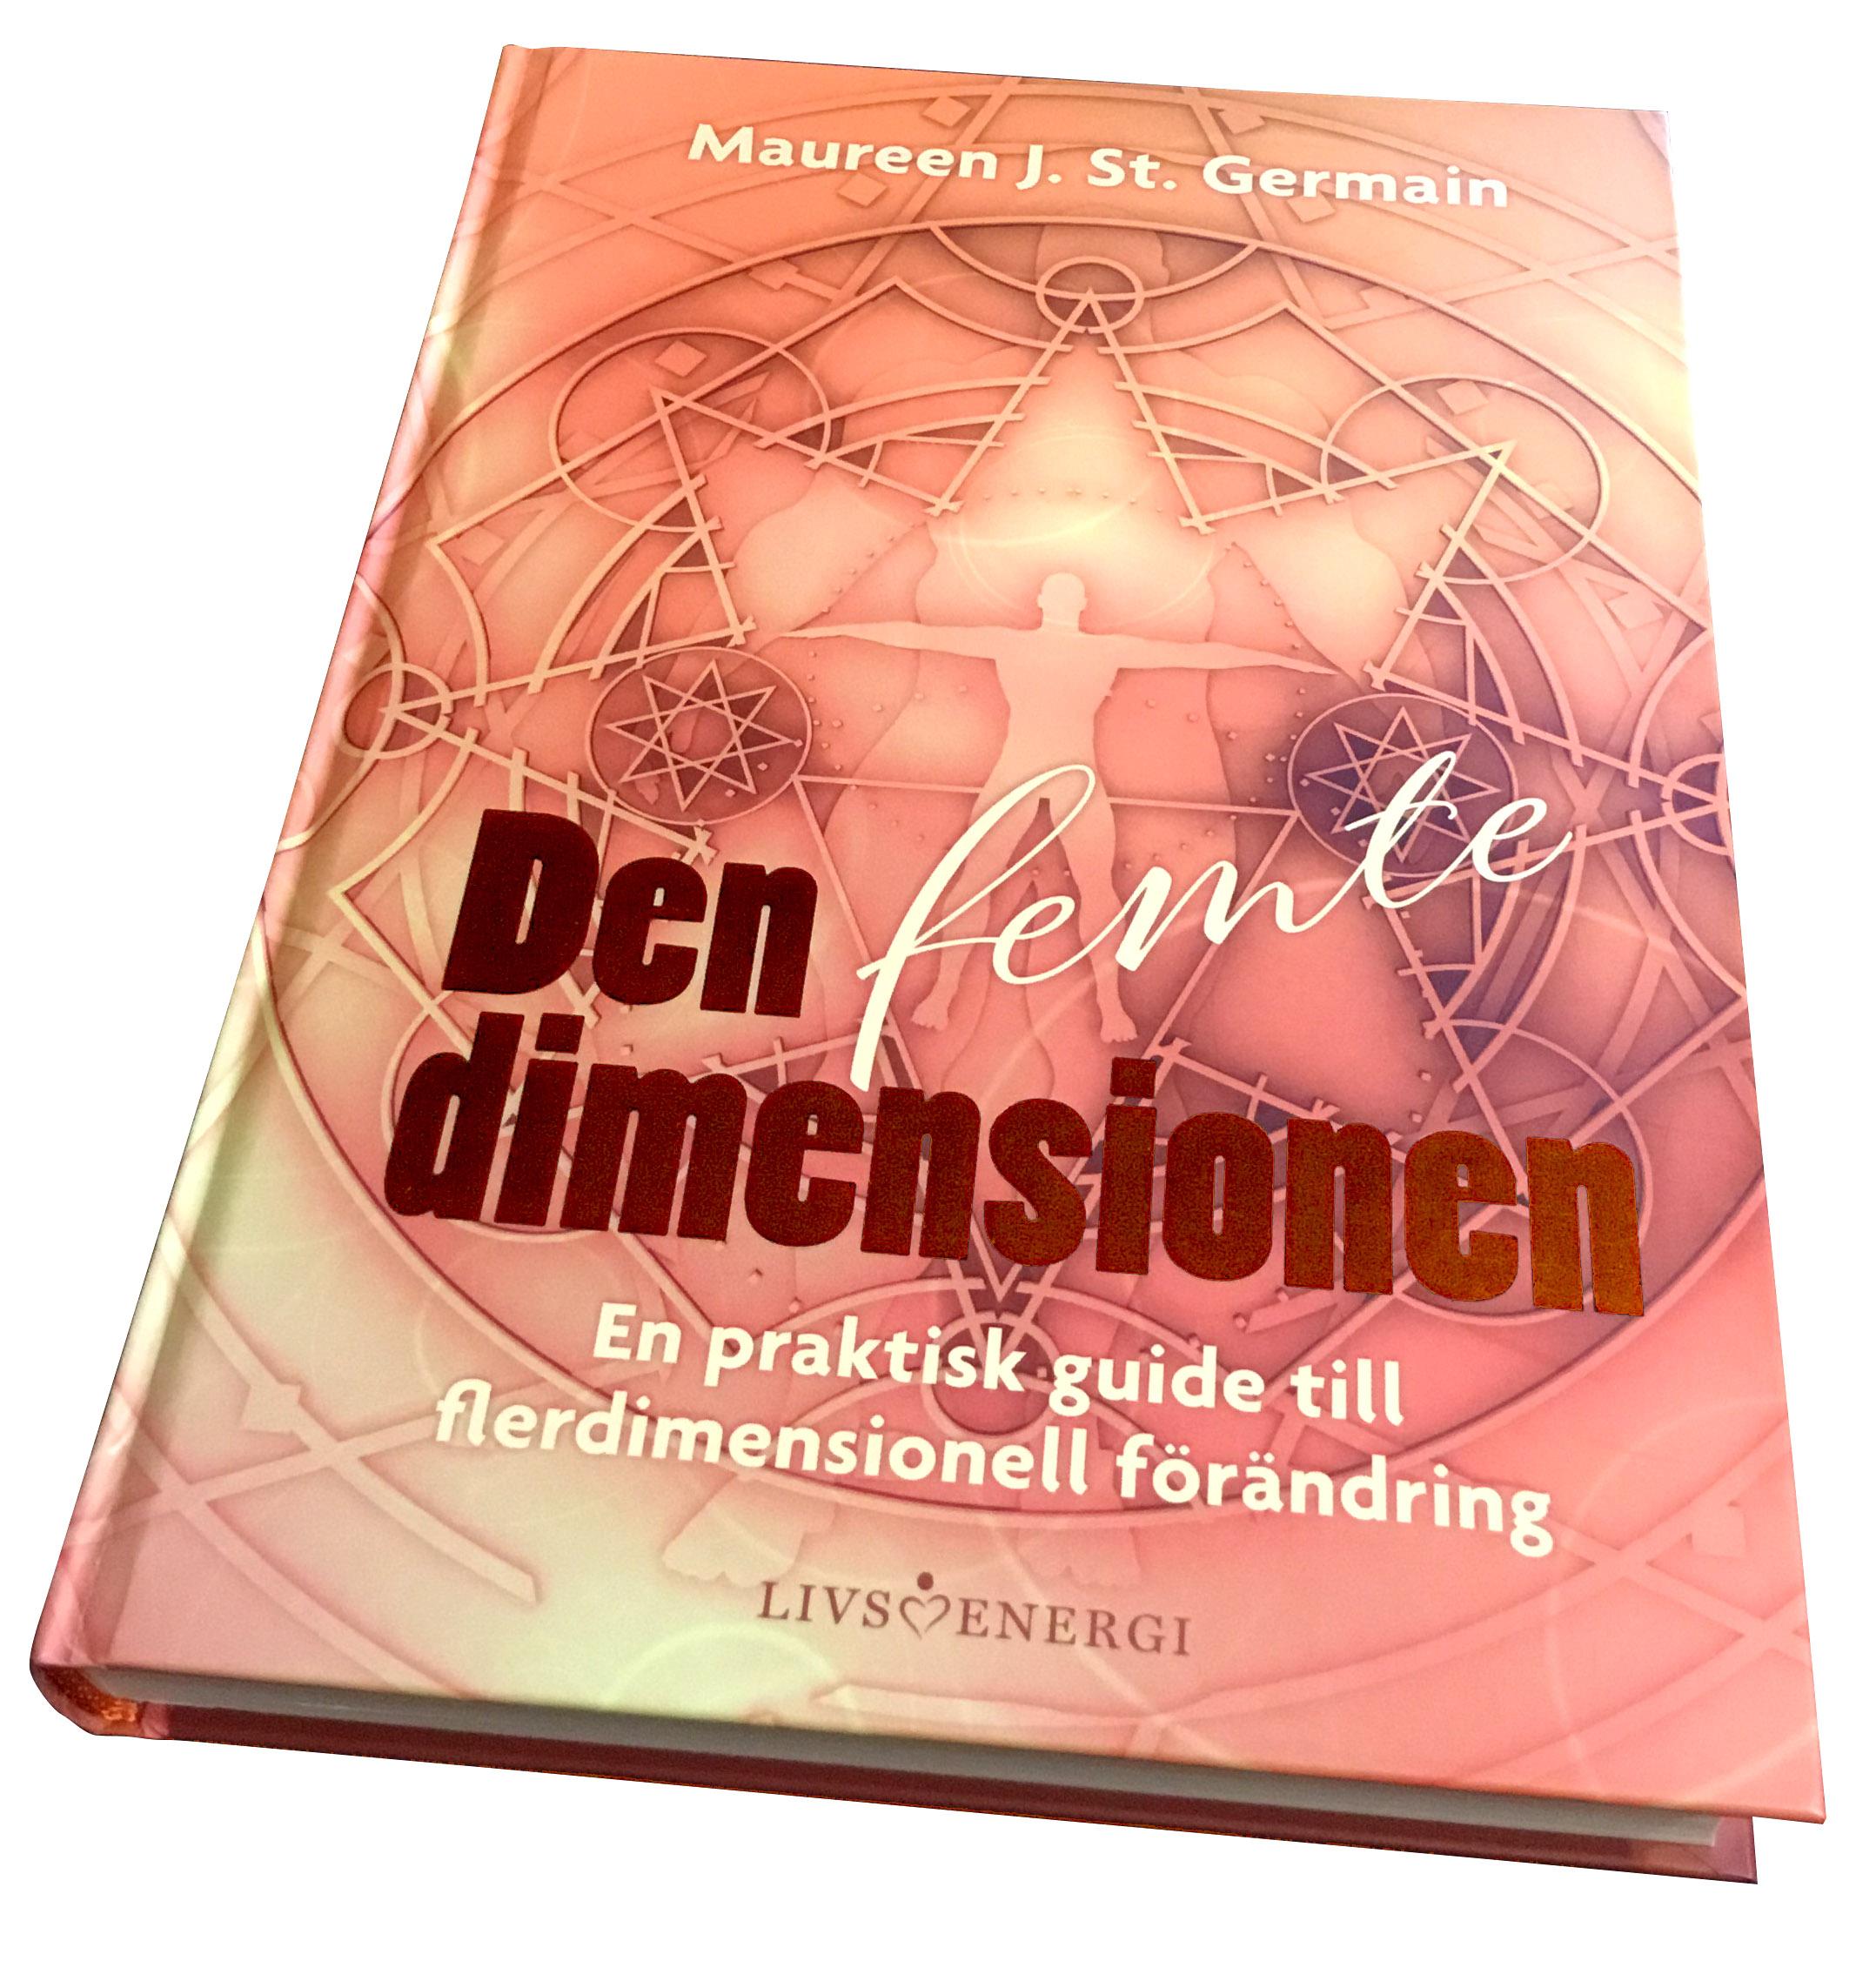 Den femte dimensionen / Maureen J. St. Germain